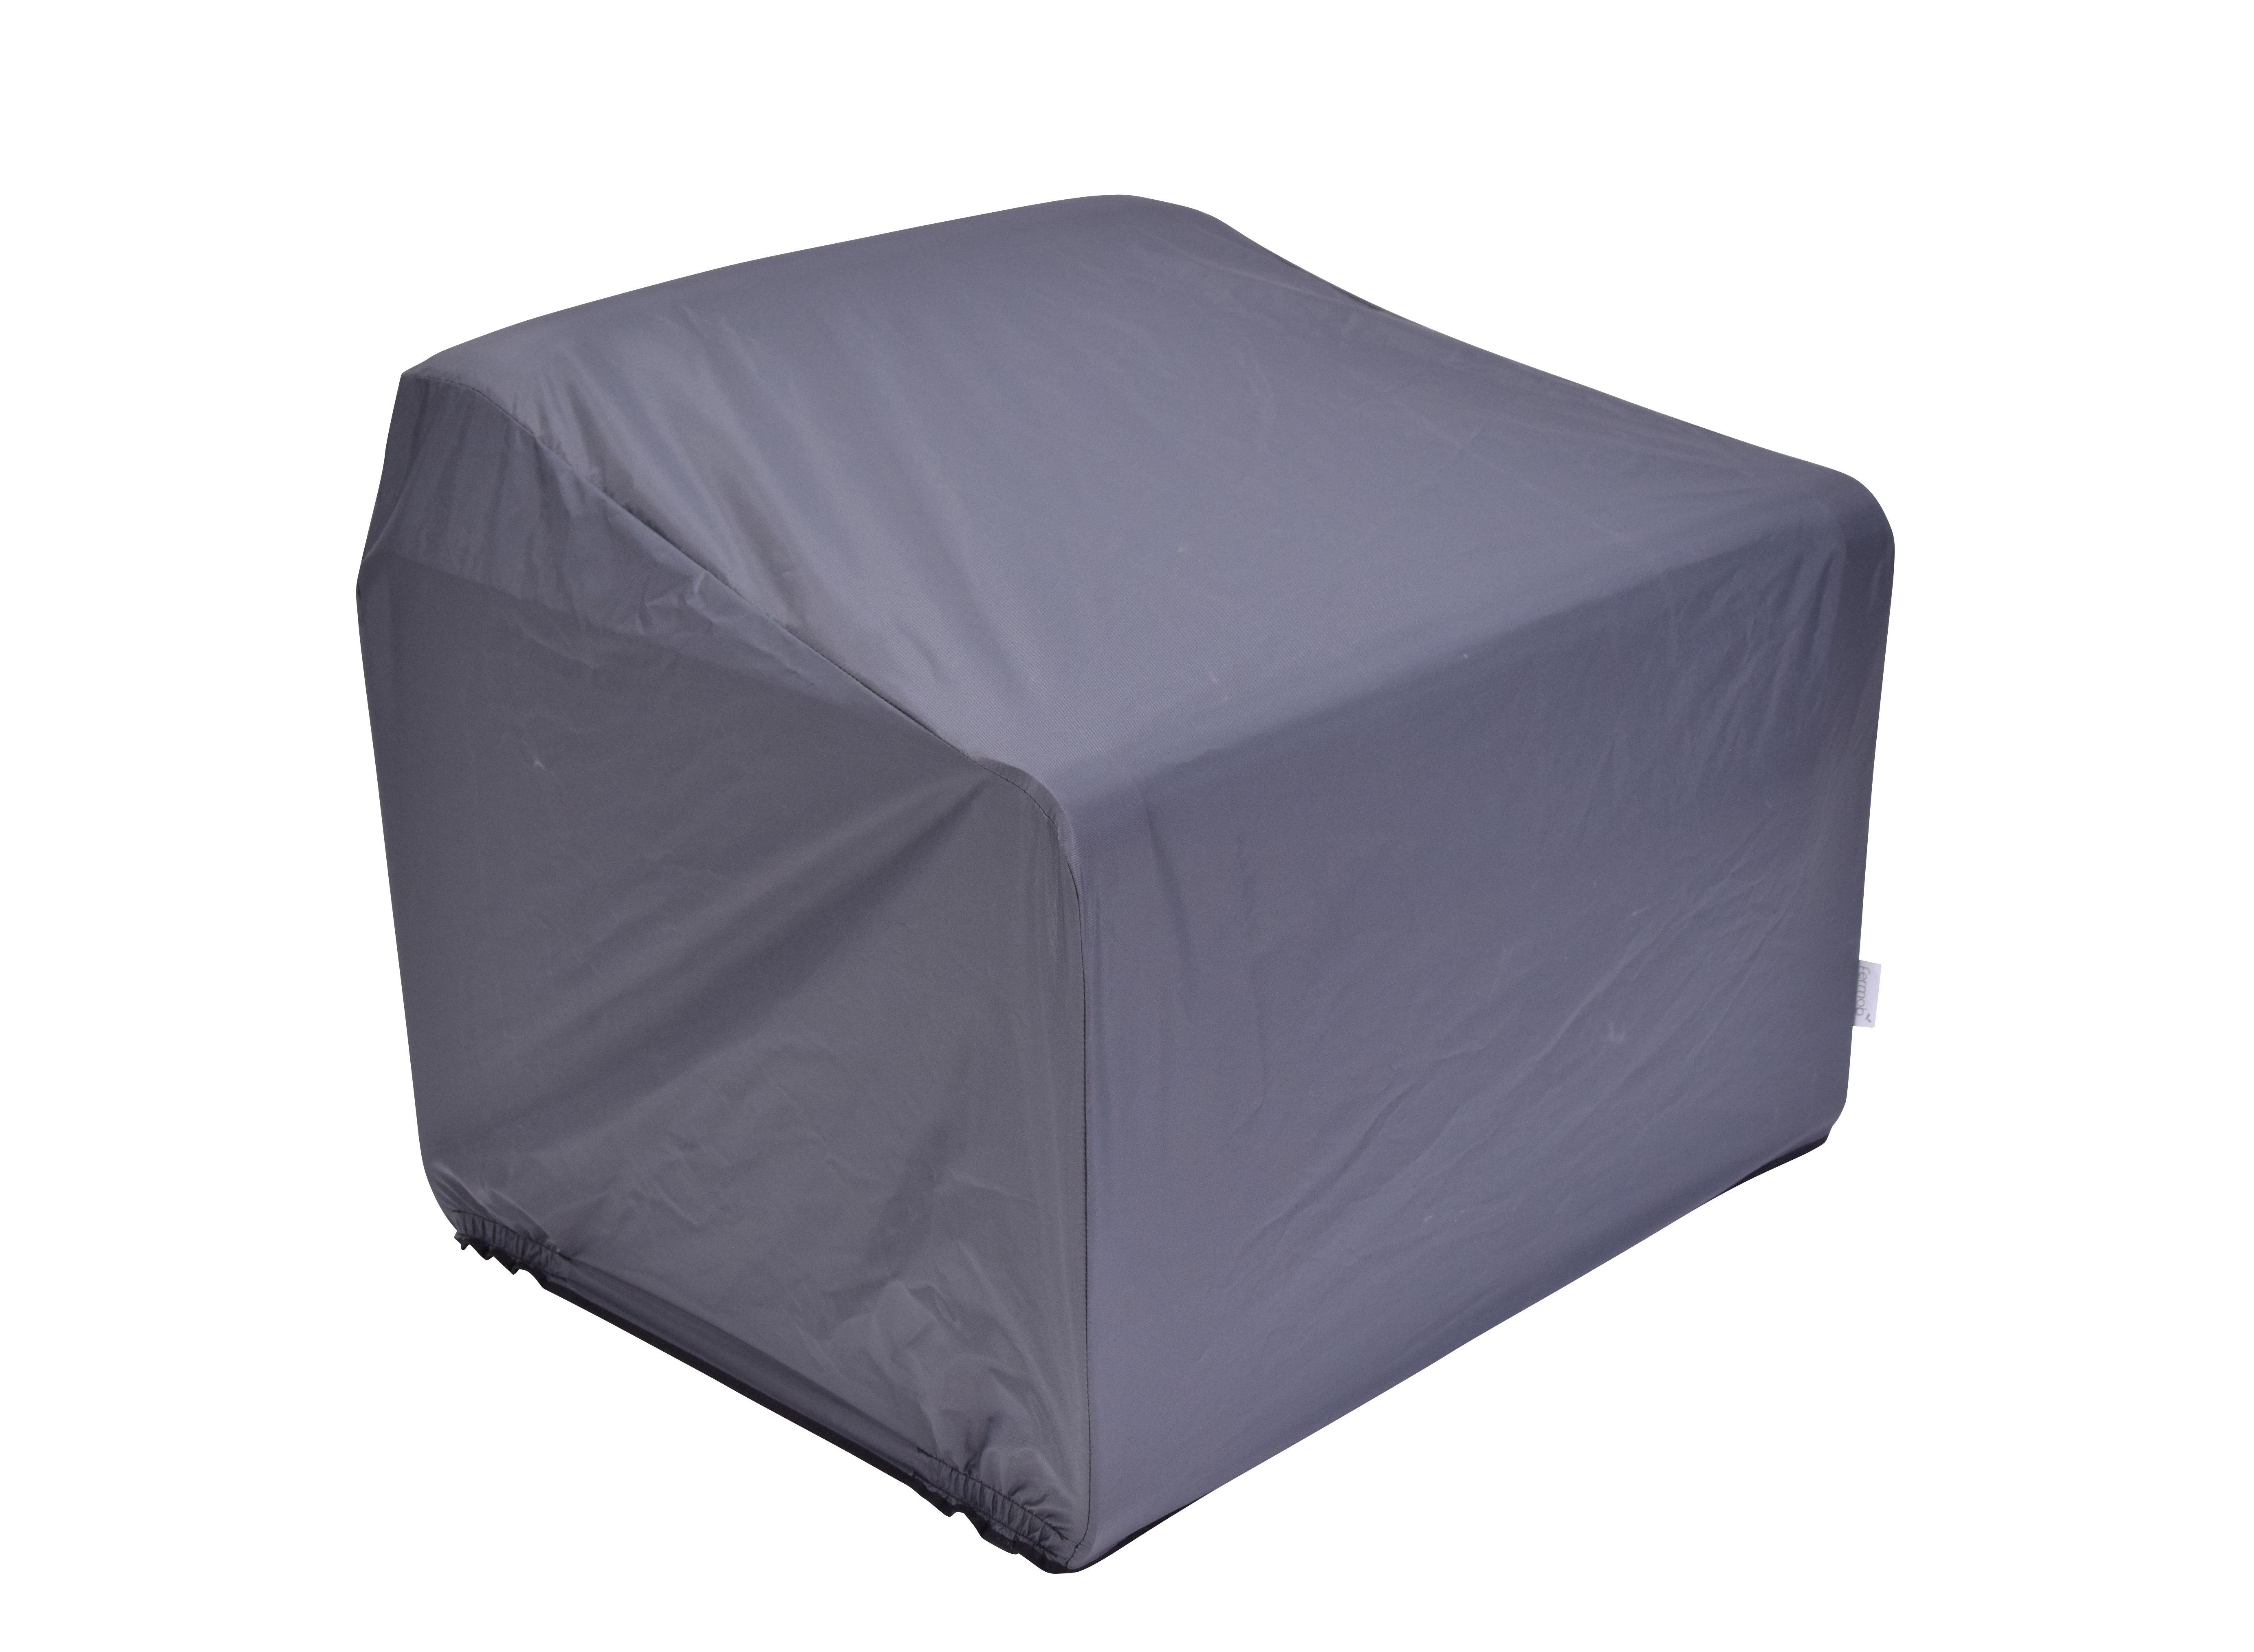 Outdoor - Sedie - Fodera di protezione - / per poltrona Bellevie di Fermob - Carbone - Poliammide